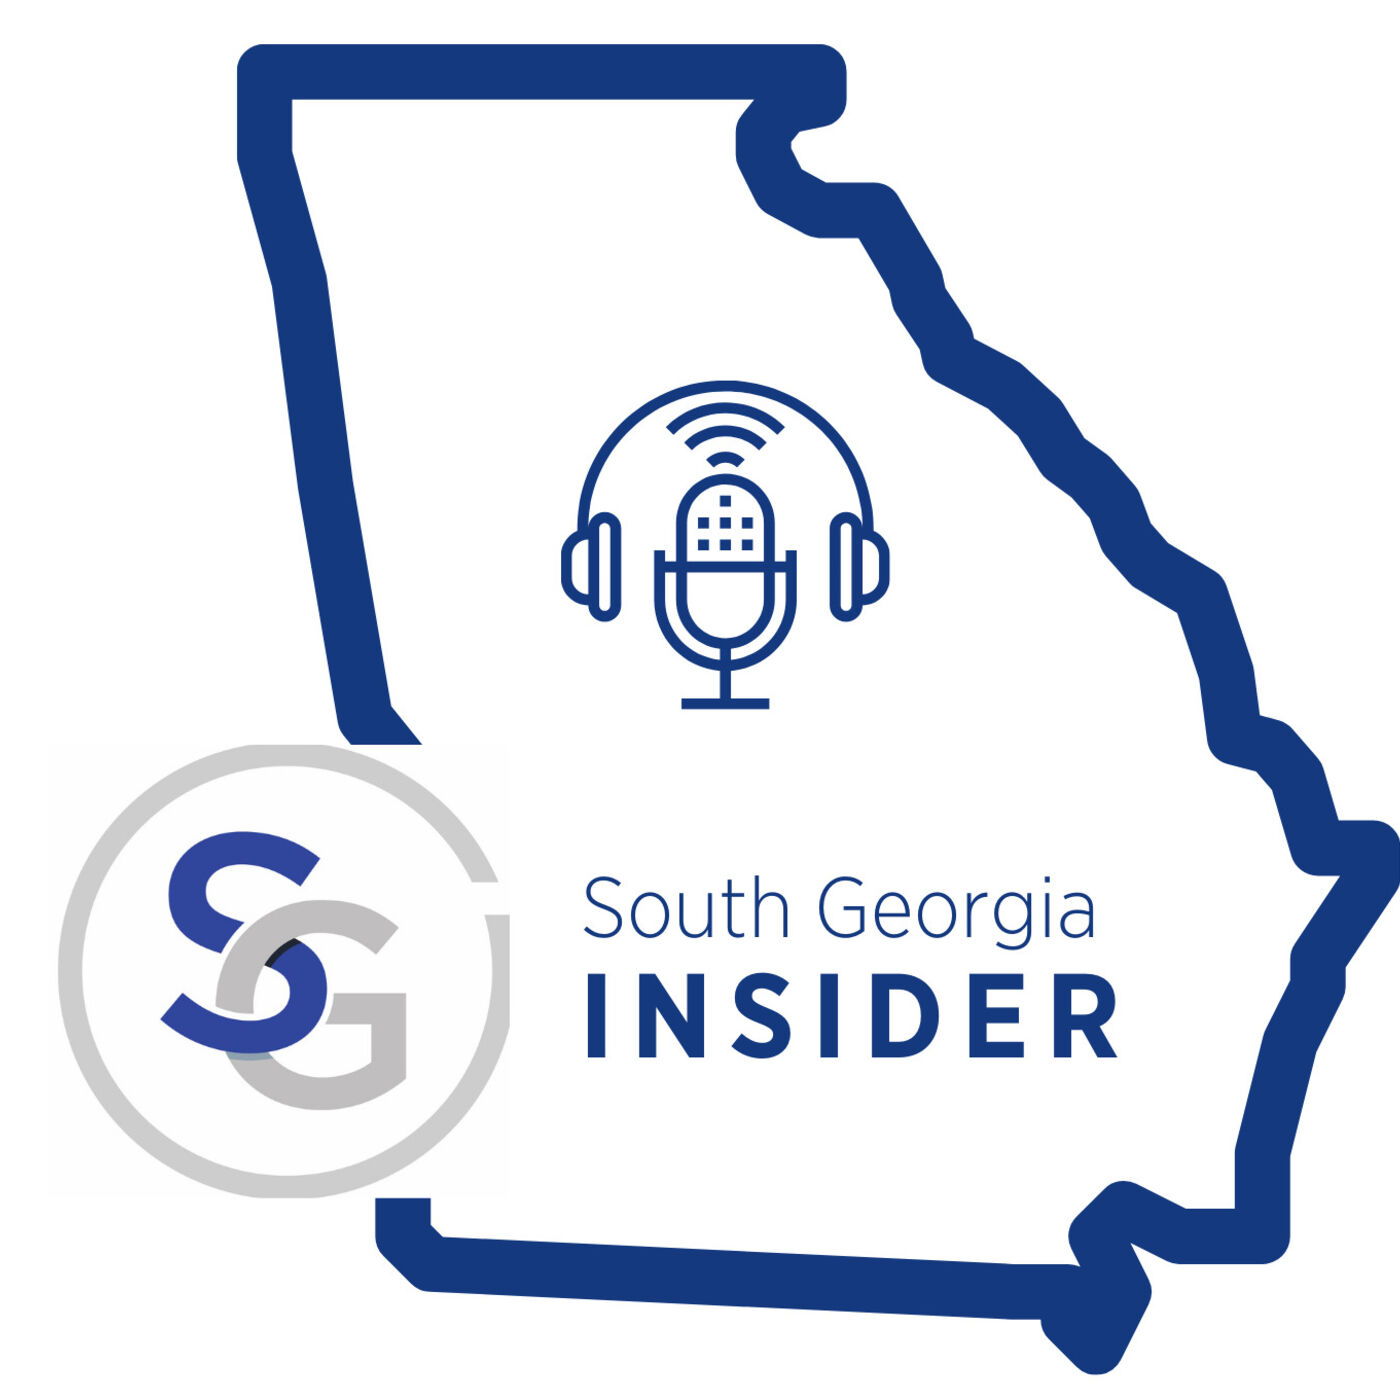 Introducing South Georgia Insider